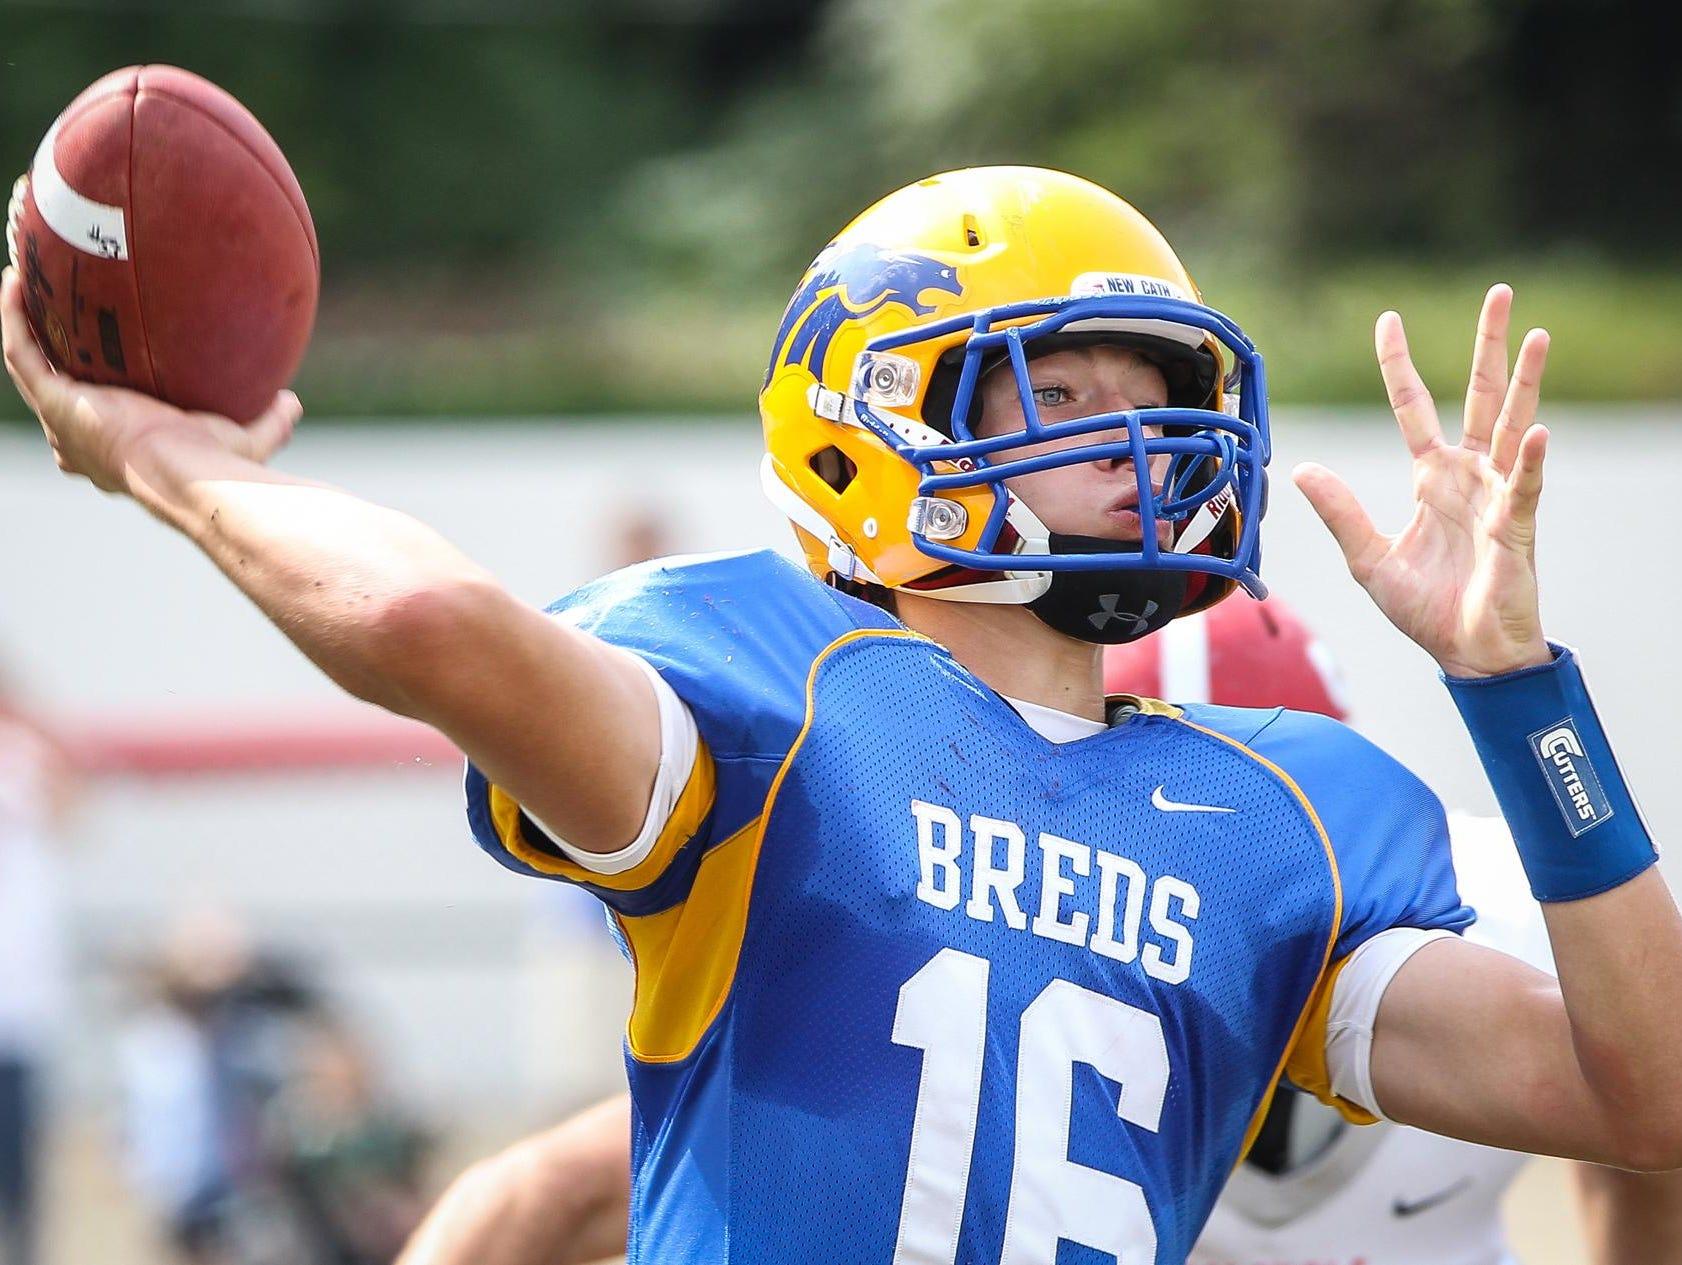 Junior Patrick Henschen begins his second season as Newport Central Catholic's quarterback.